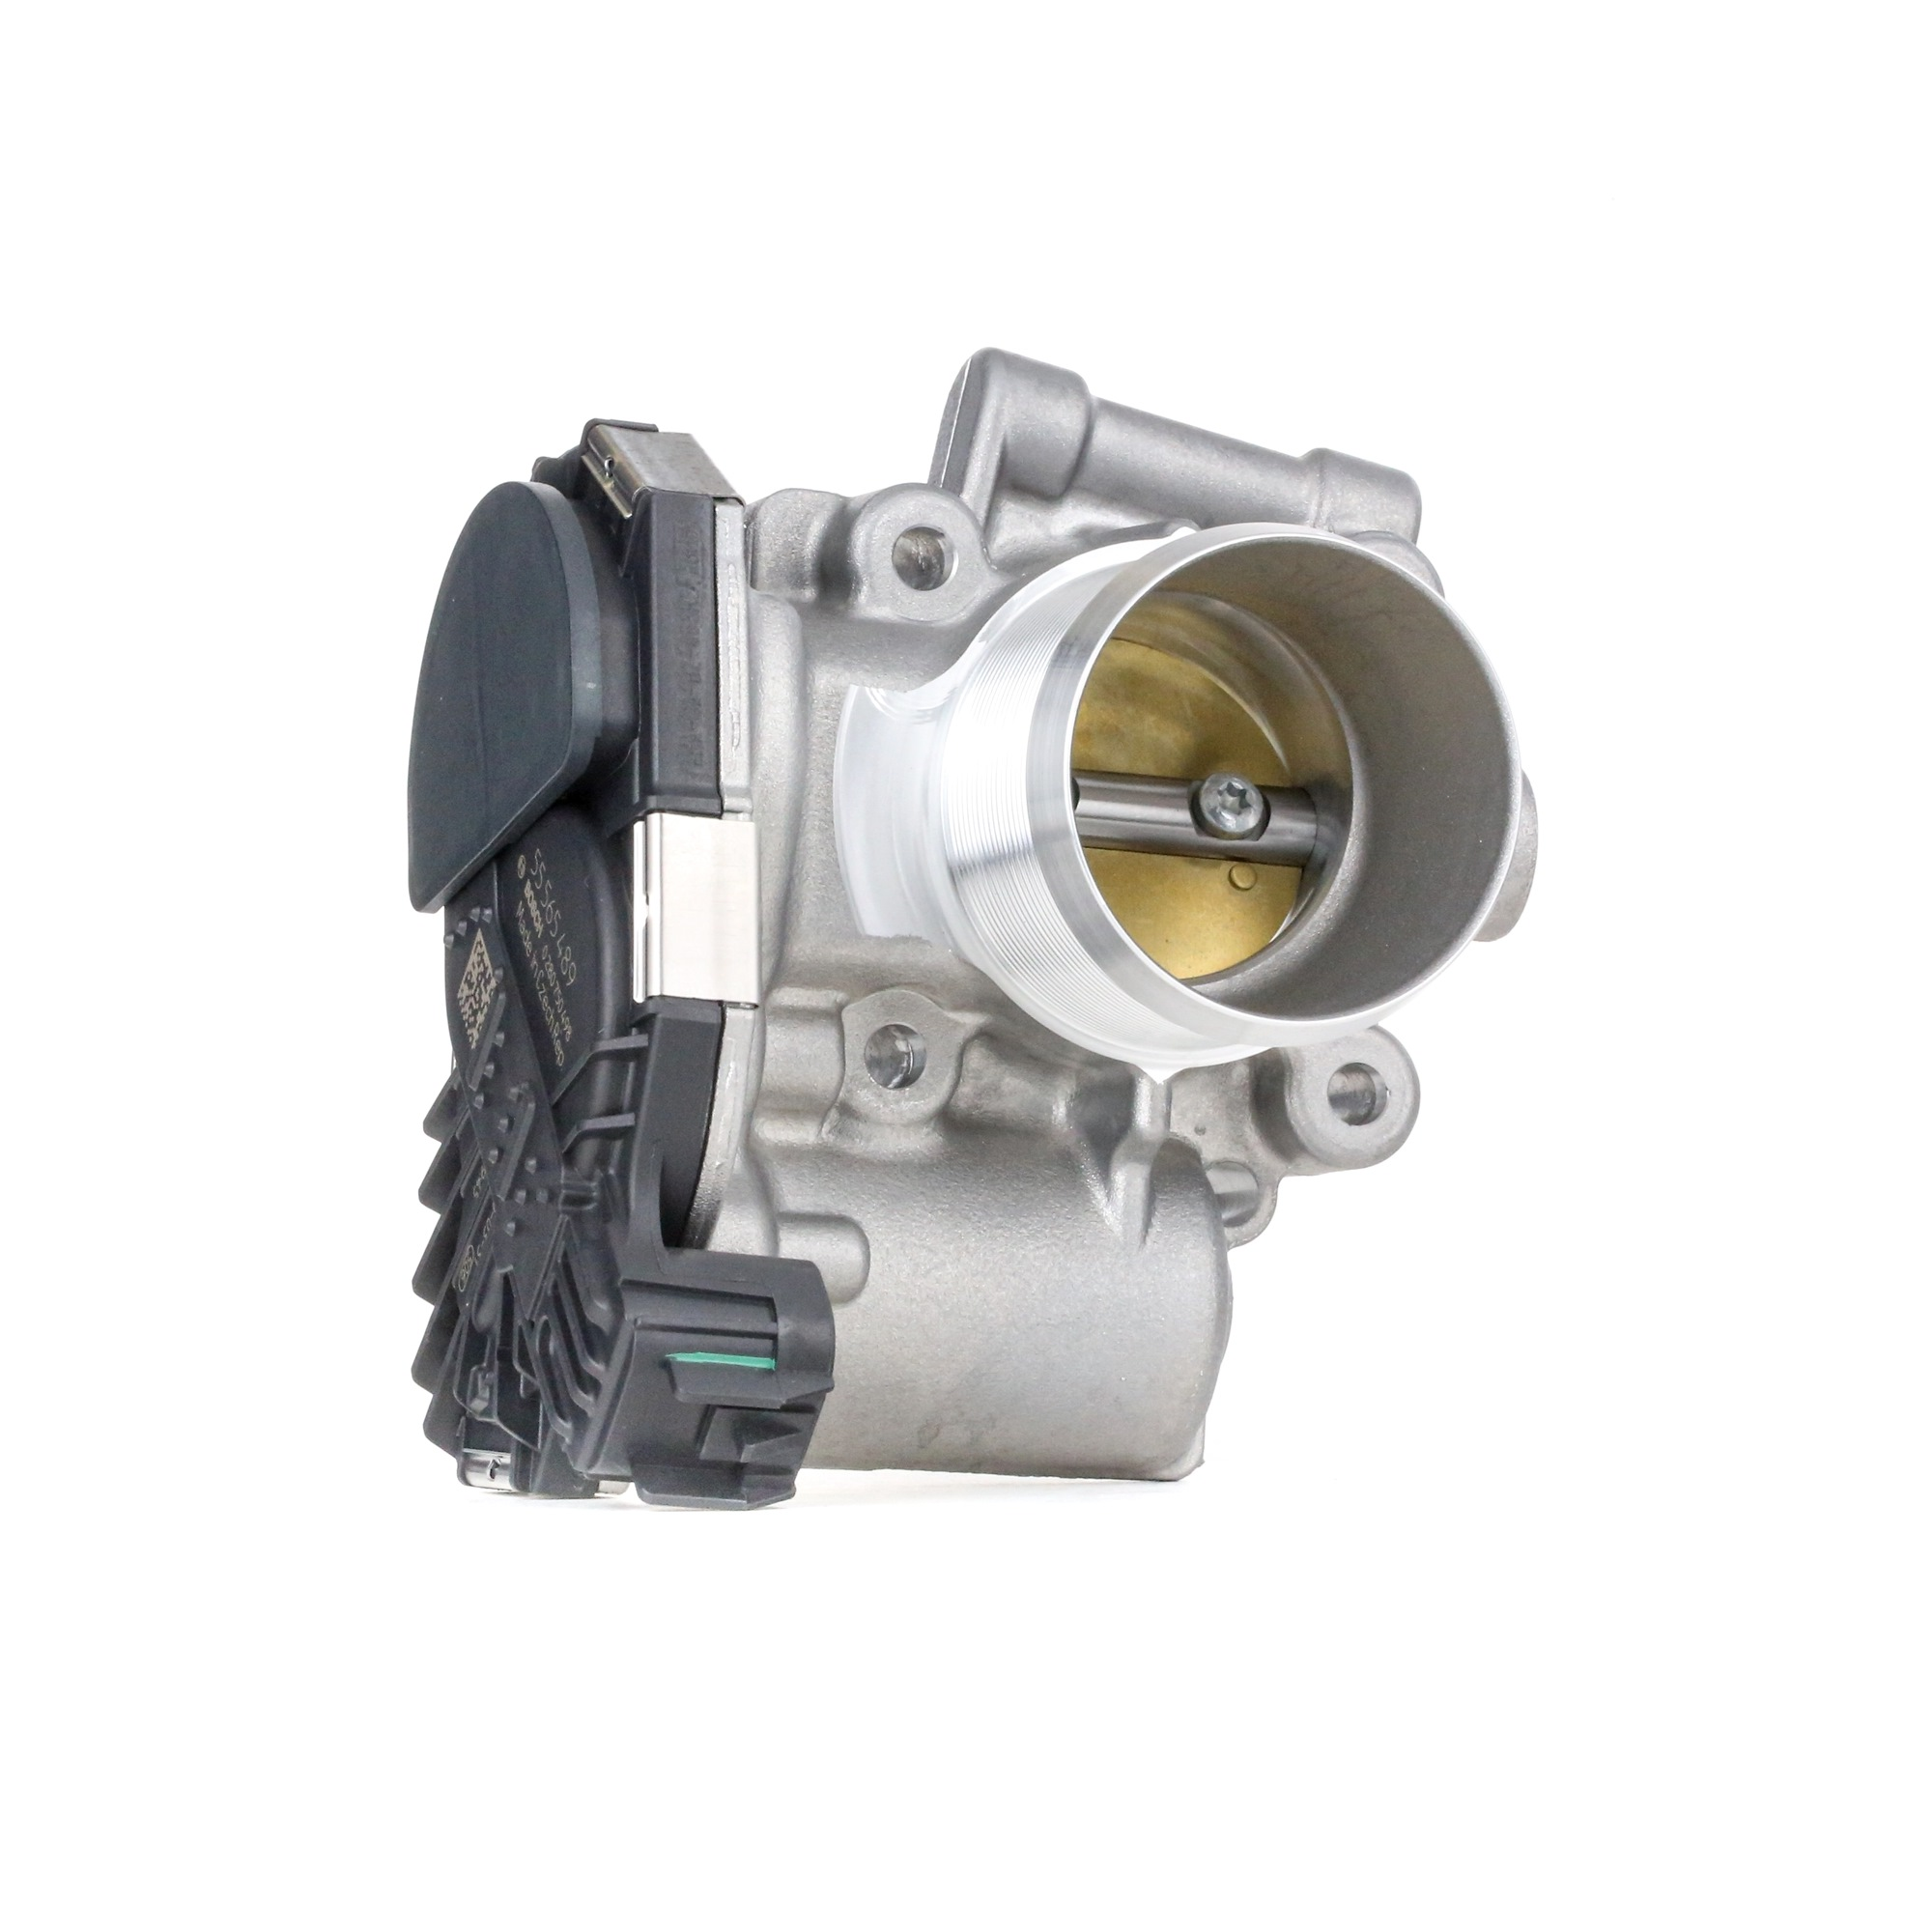 BOSCH Throttle OPEL,CHEVROLET,VAUXHALL 0 280 750 498 55565489,55565489 Throttle Body,Throttle body